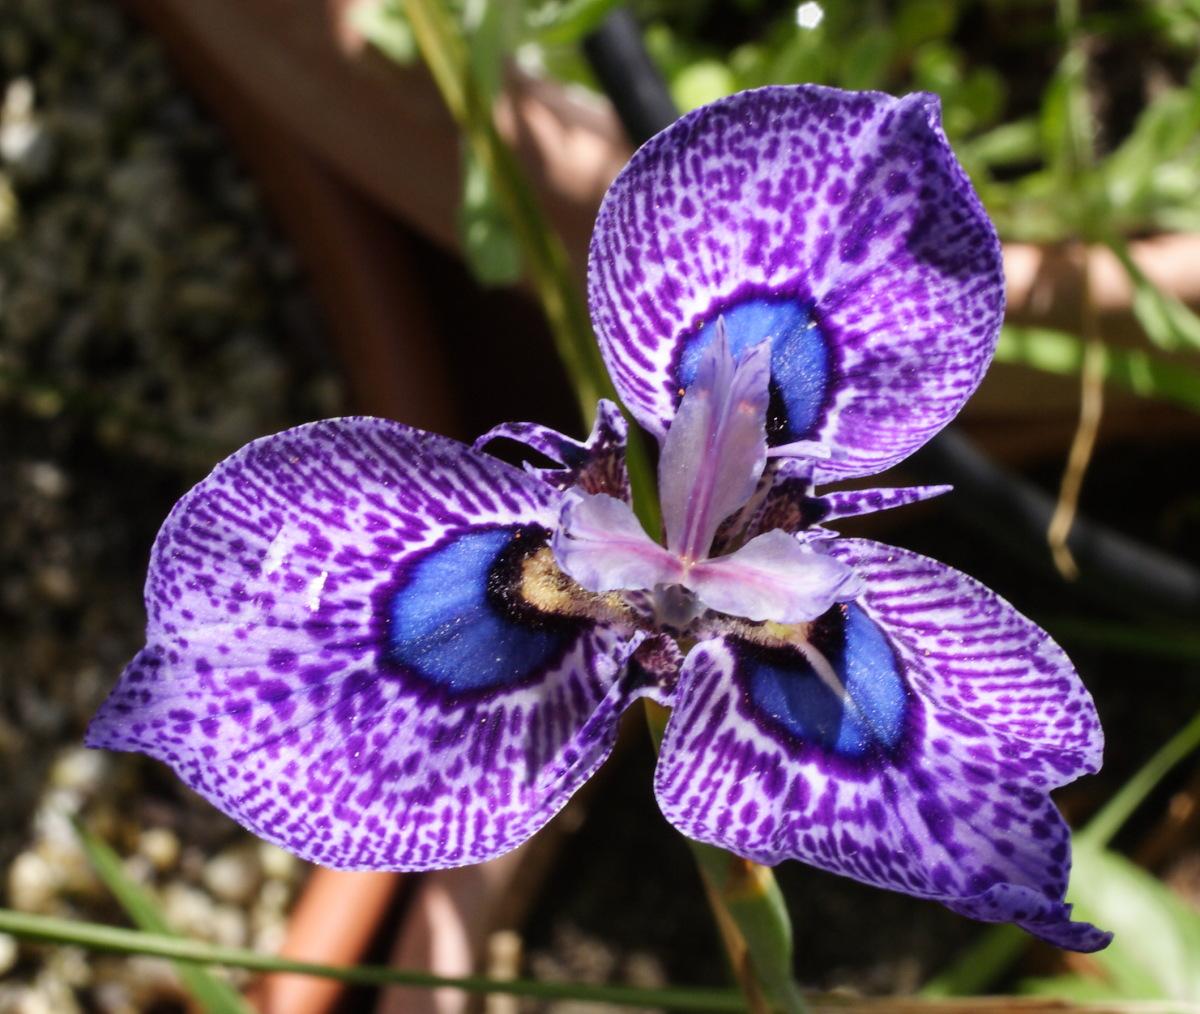 Top 28 cool flowers to grow growing cool plants growing cool plants moraea calcicola - Cool plants to grow inside ...